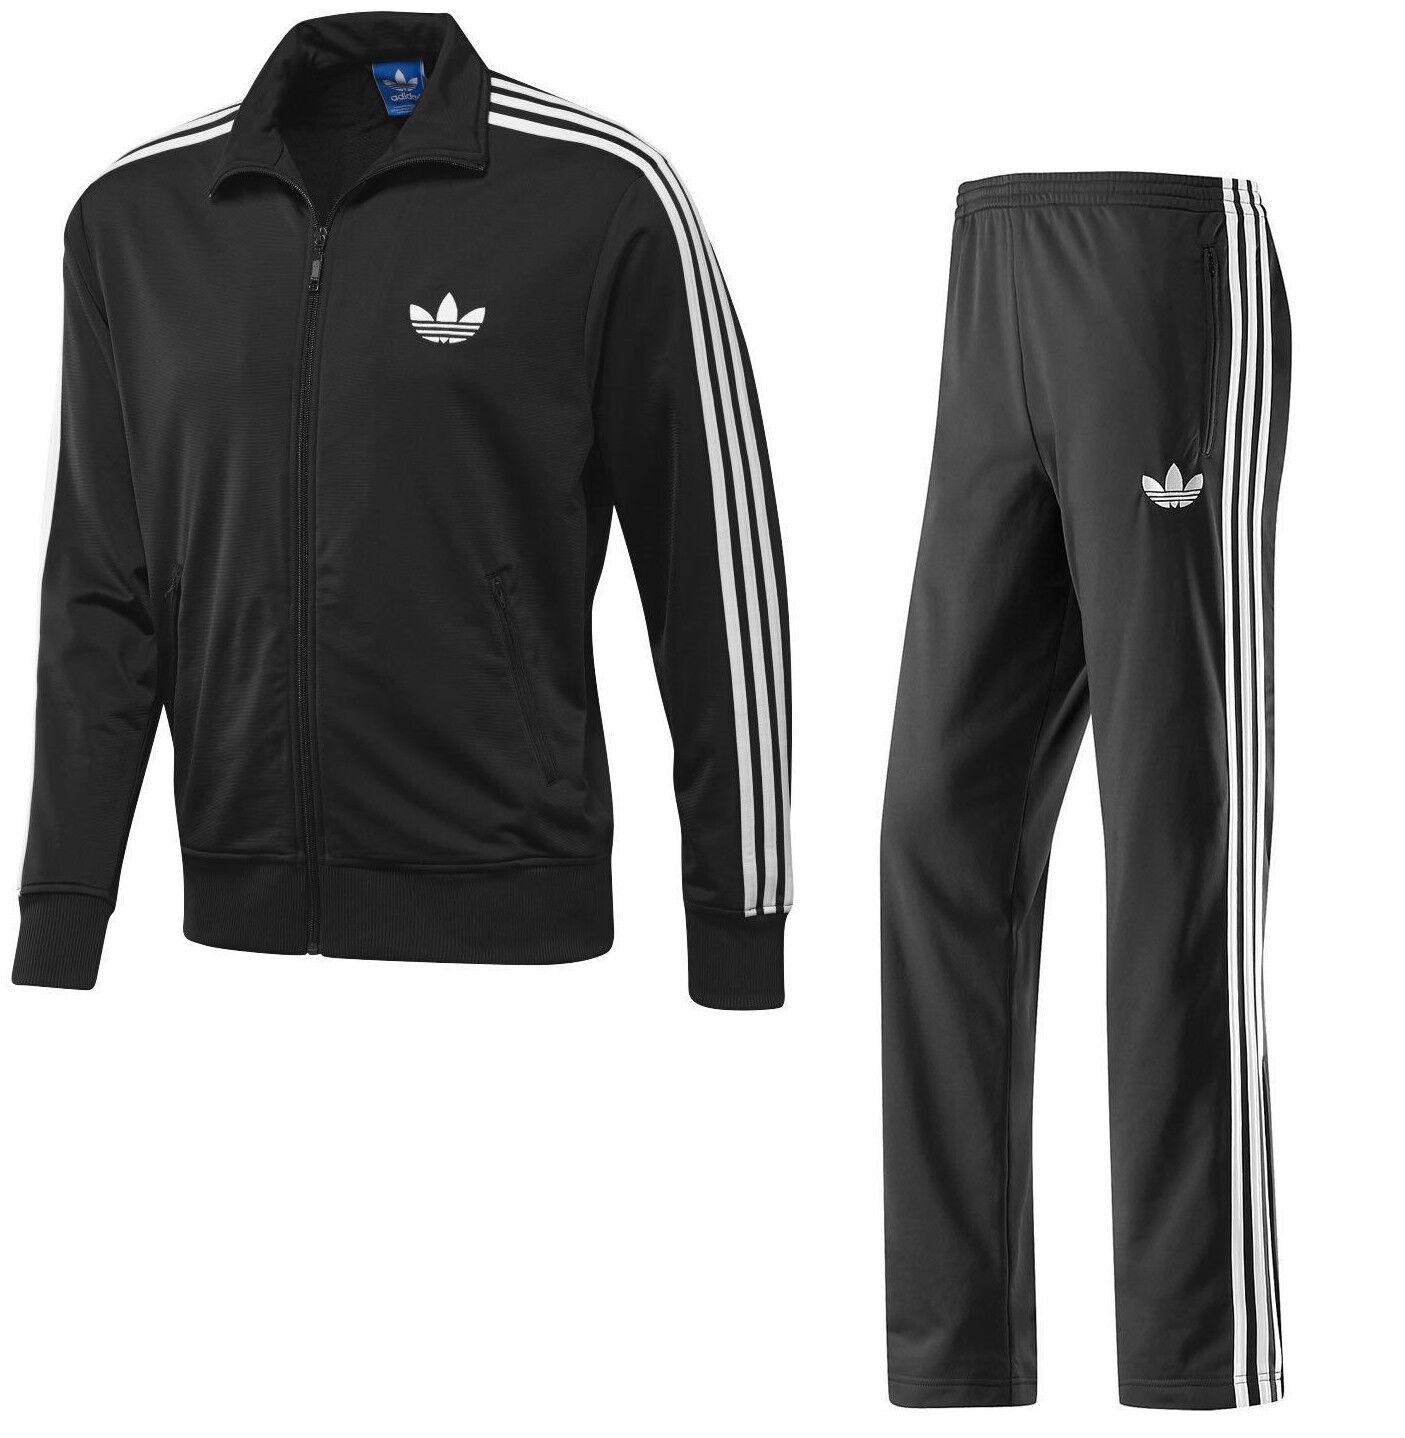 Herren Adidas Originals ADI Firebird Trainingsanzug Anzughose Trainingsjacke Top S - XL